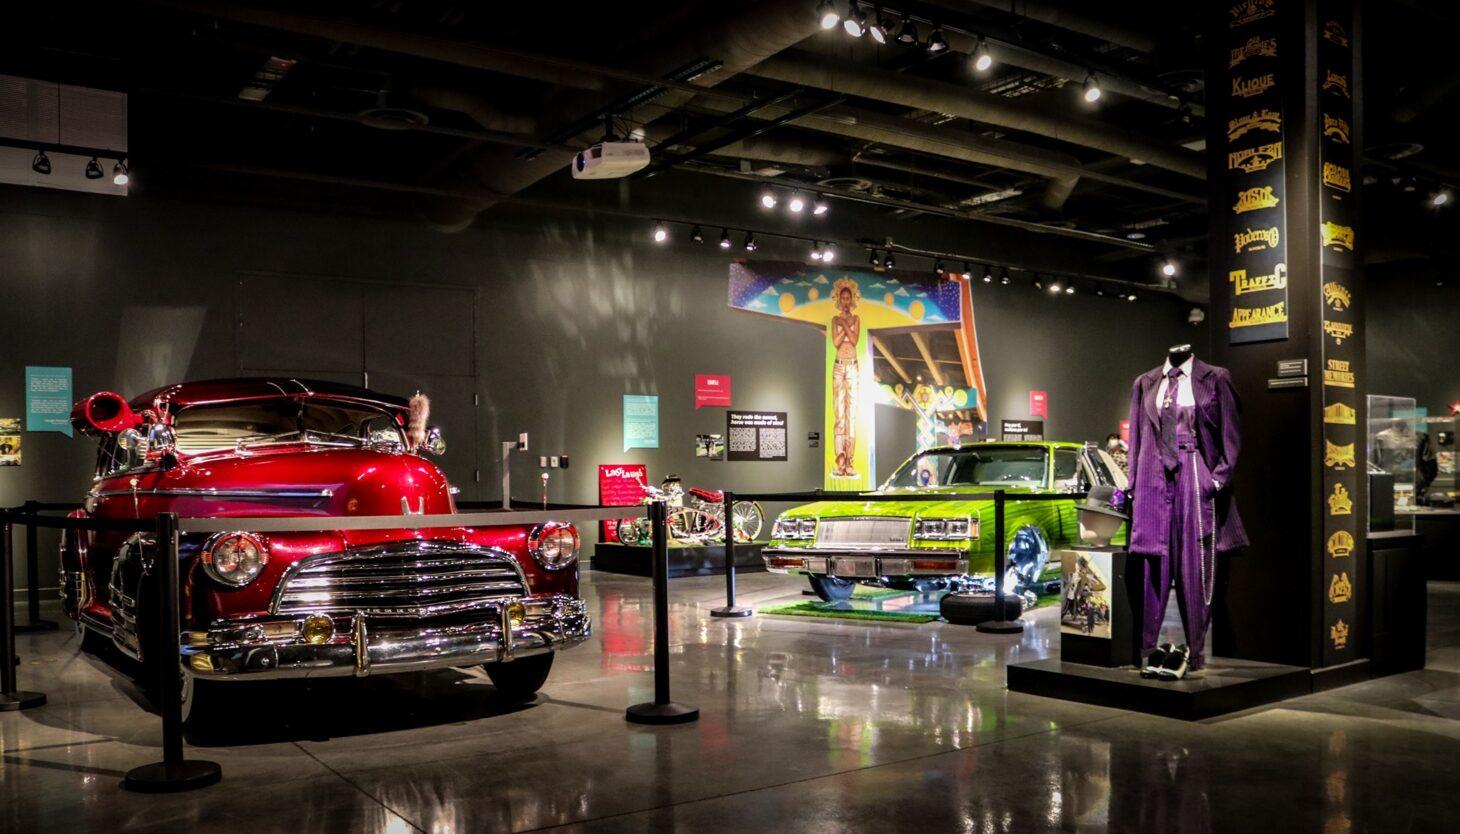 Photo courtesy El Paso Museum of History